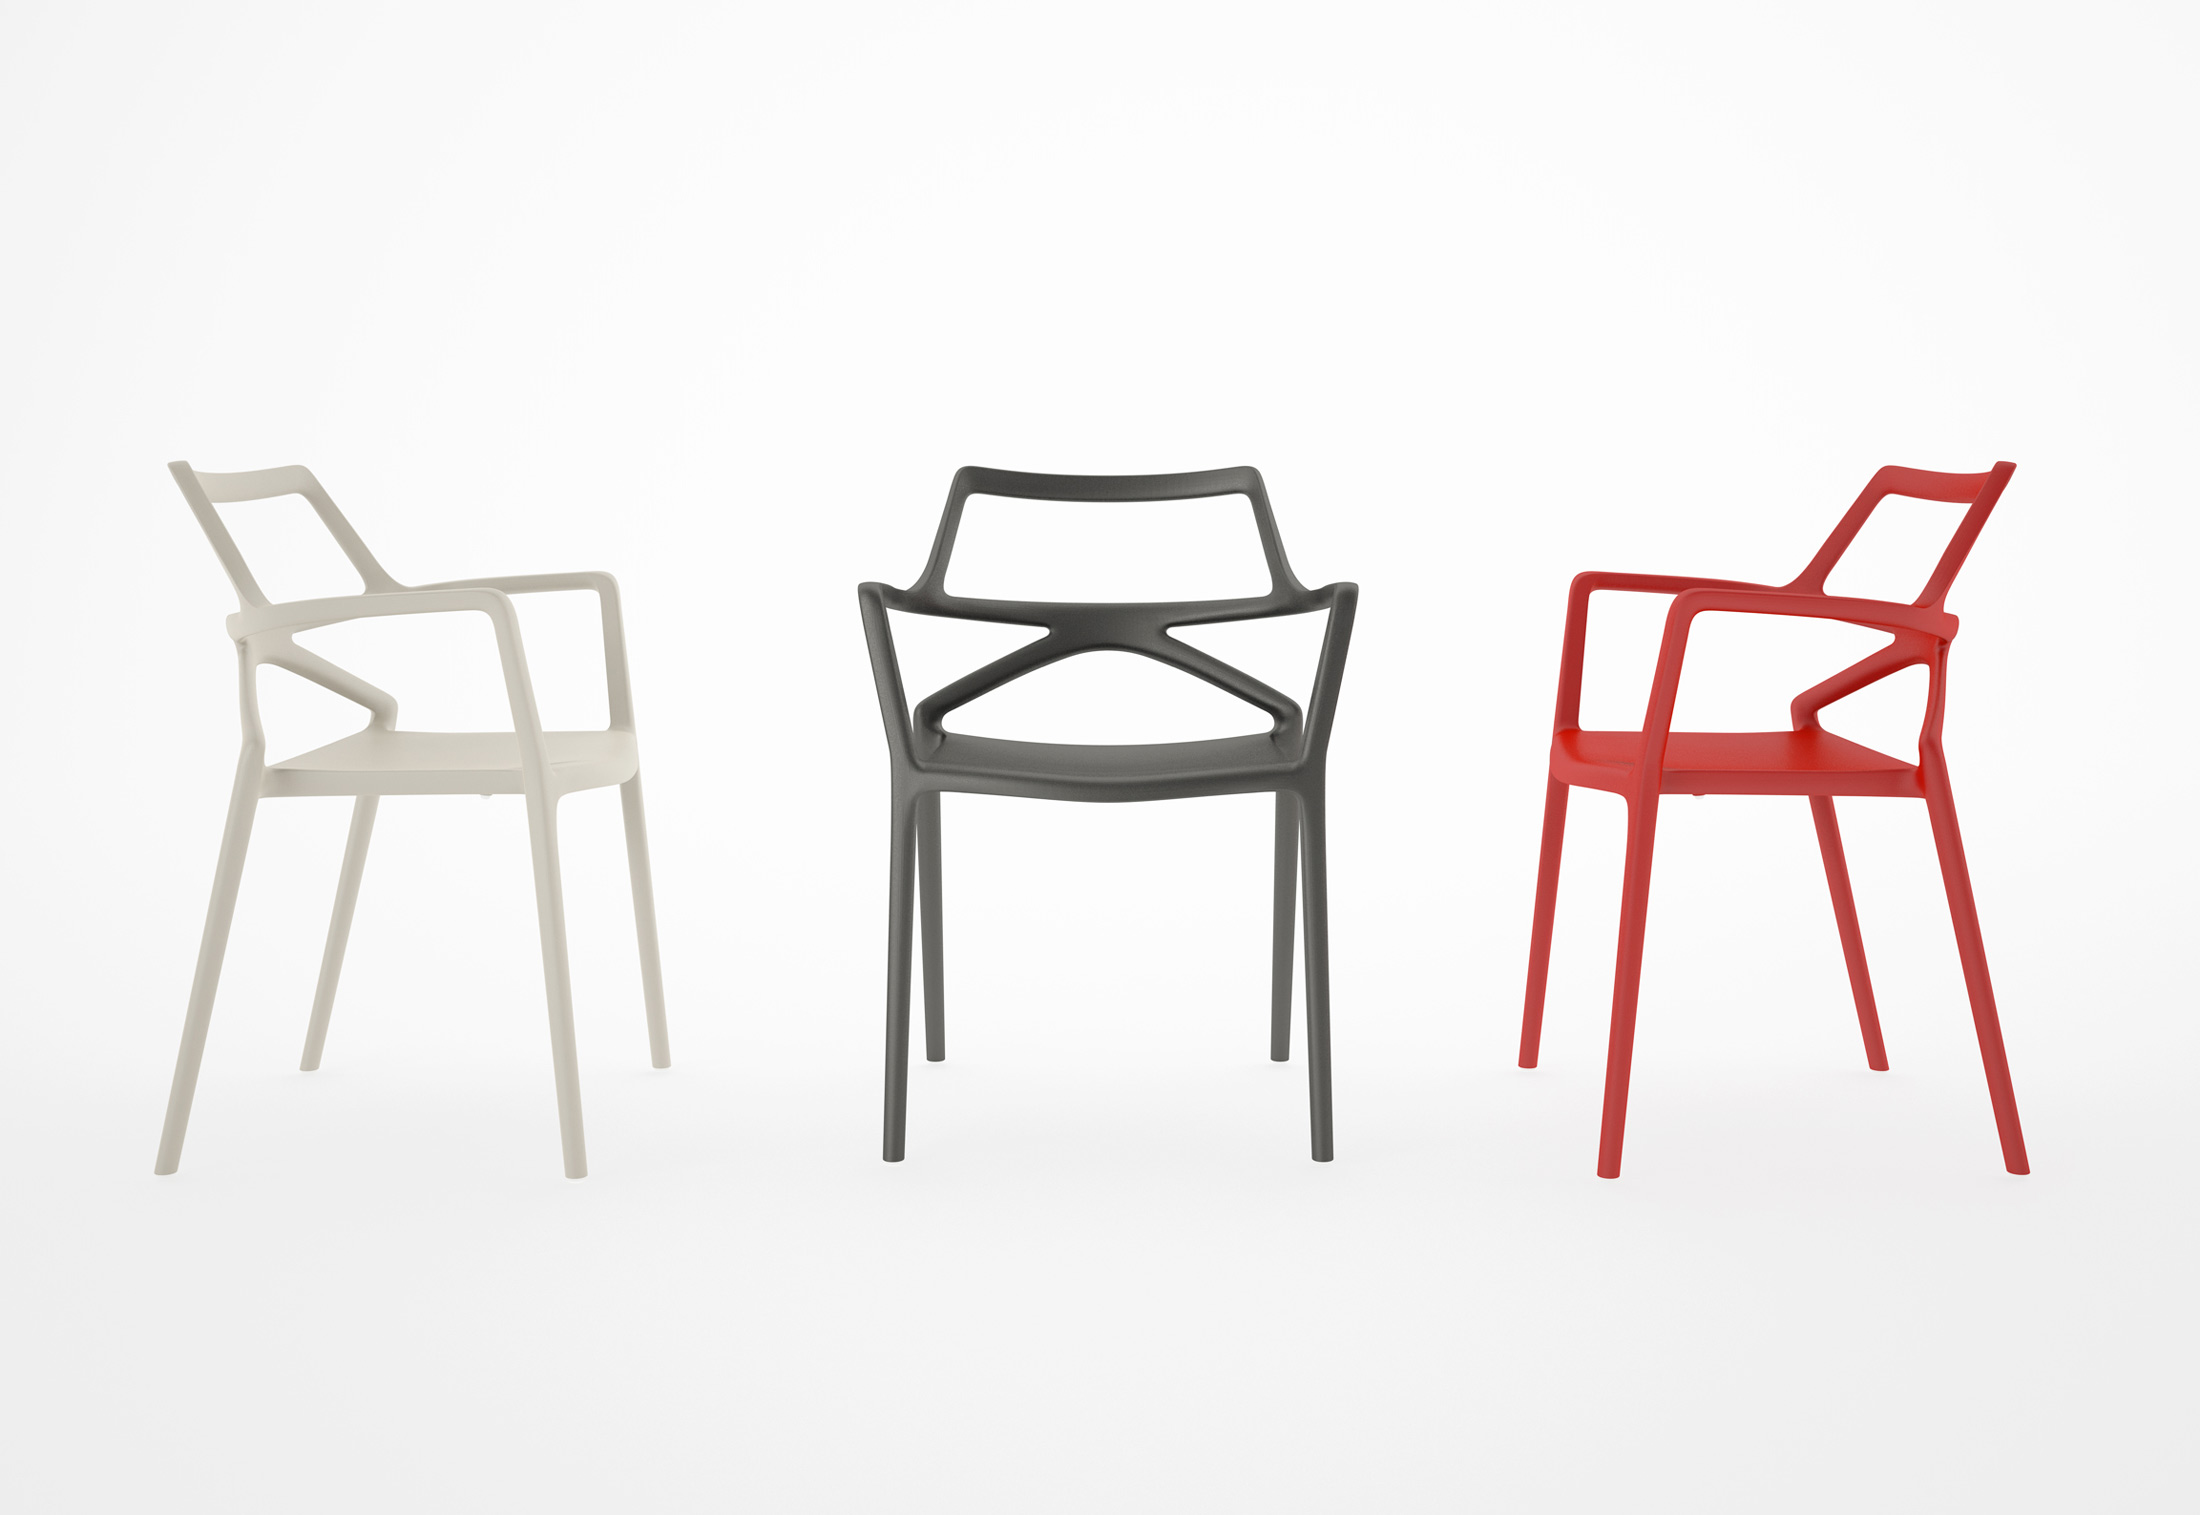 Delta Dining Chair by Jorge Pensi for Vondom